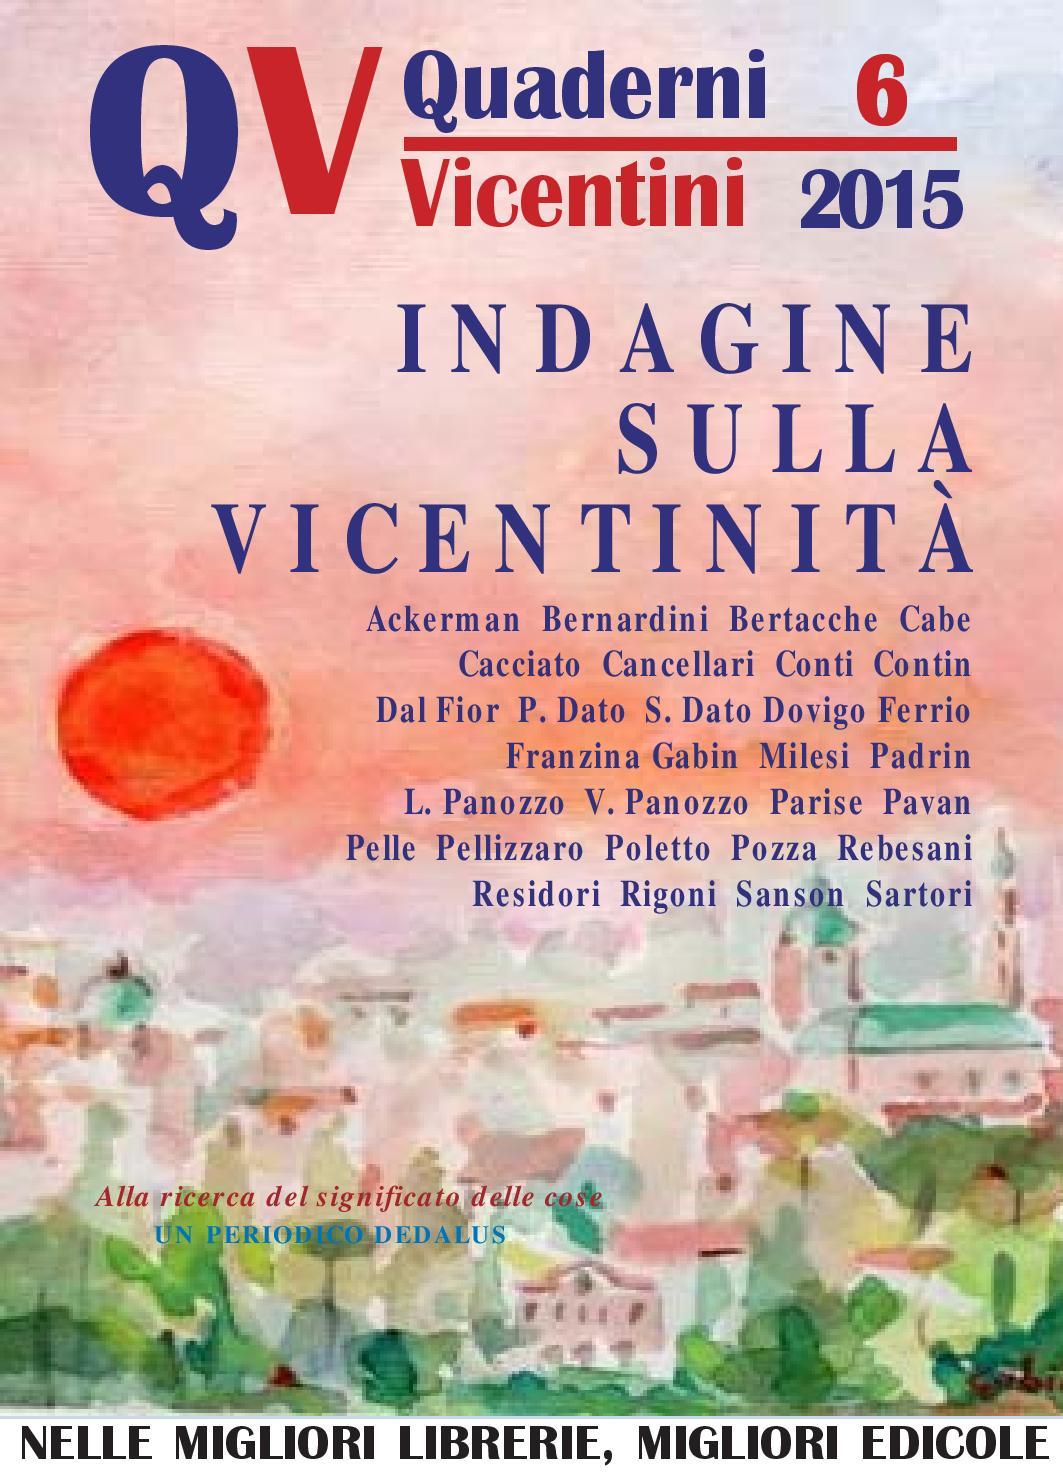 6-2015 - quadernivicentini.it - QV